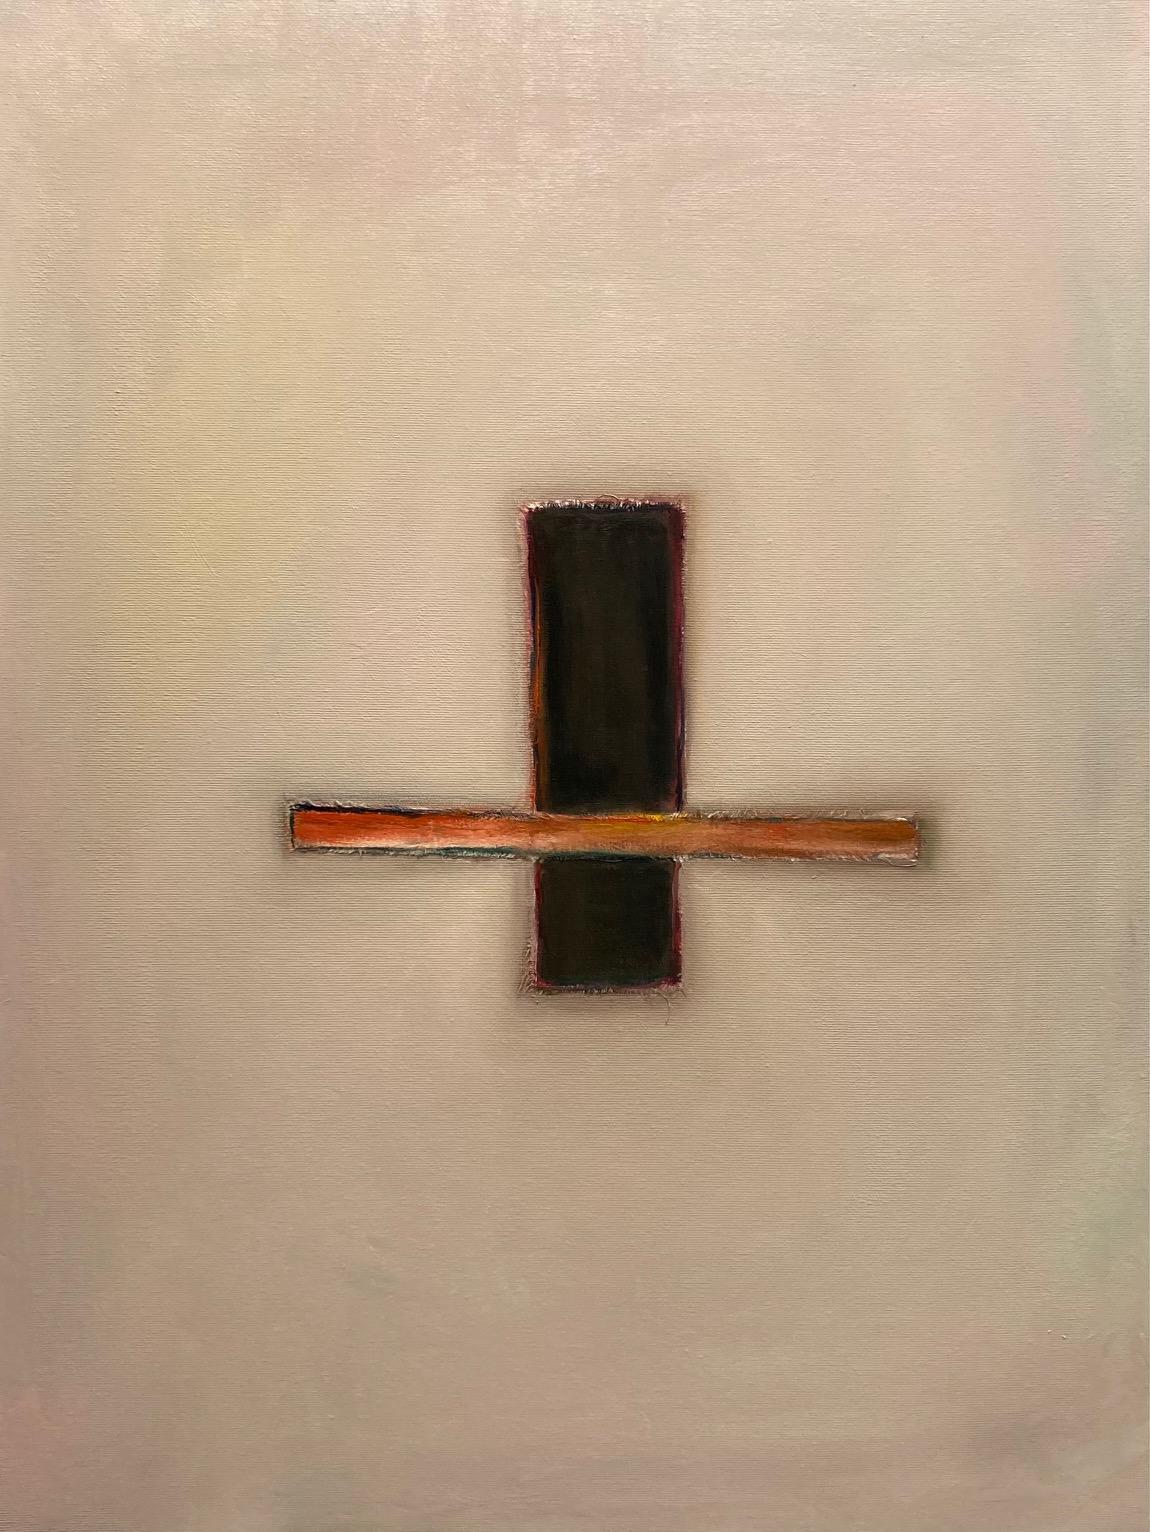 Silent Sign (1), Öl auf Leinwand, 80 x 60 cm, 2020